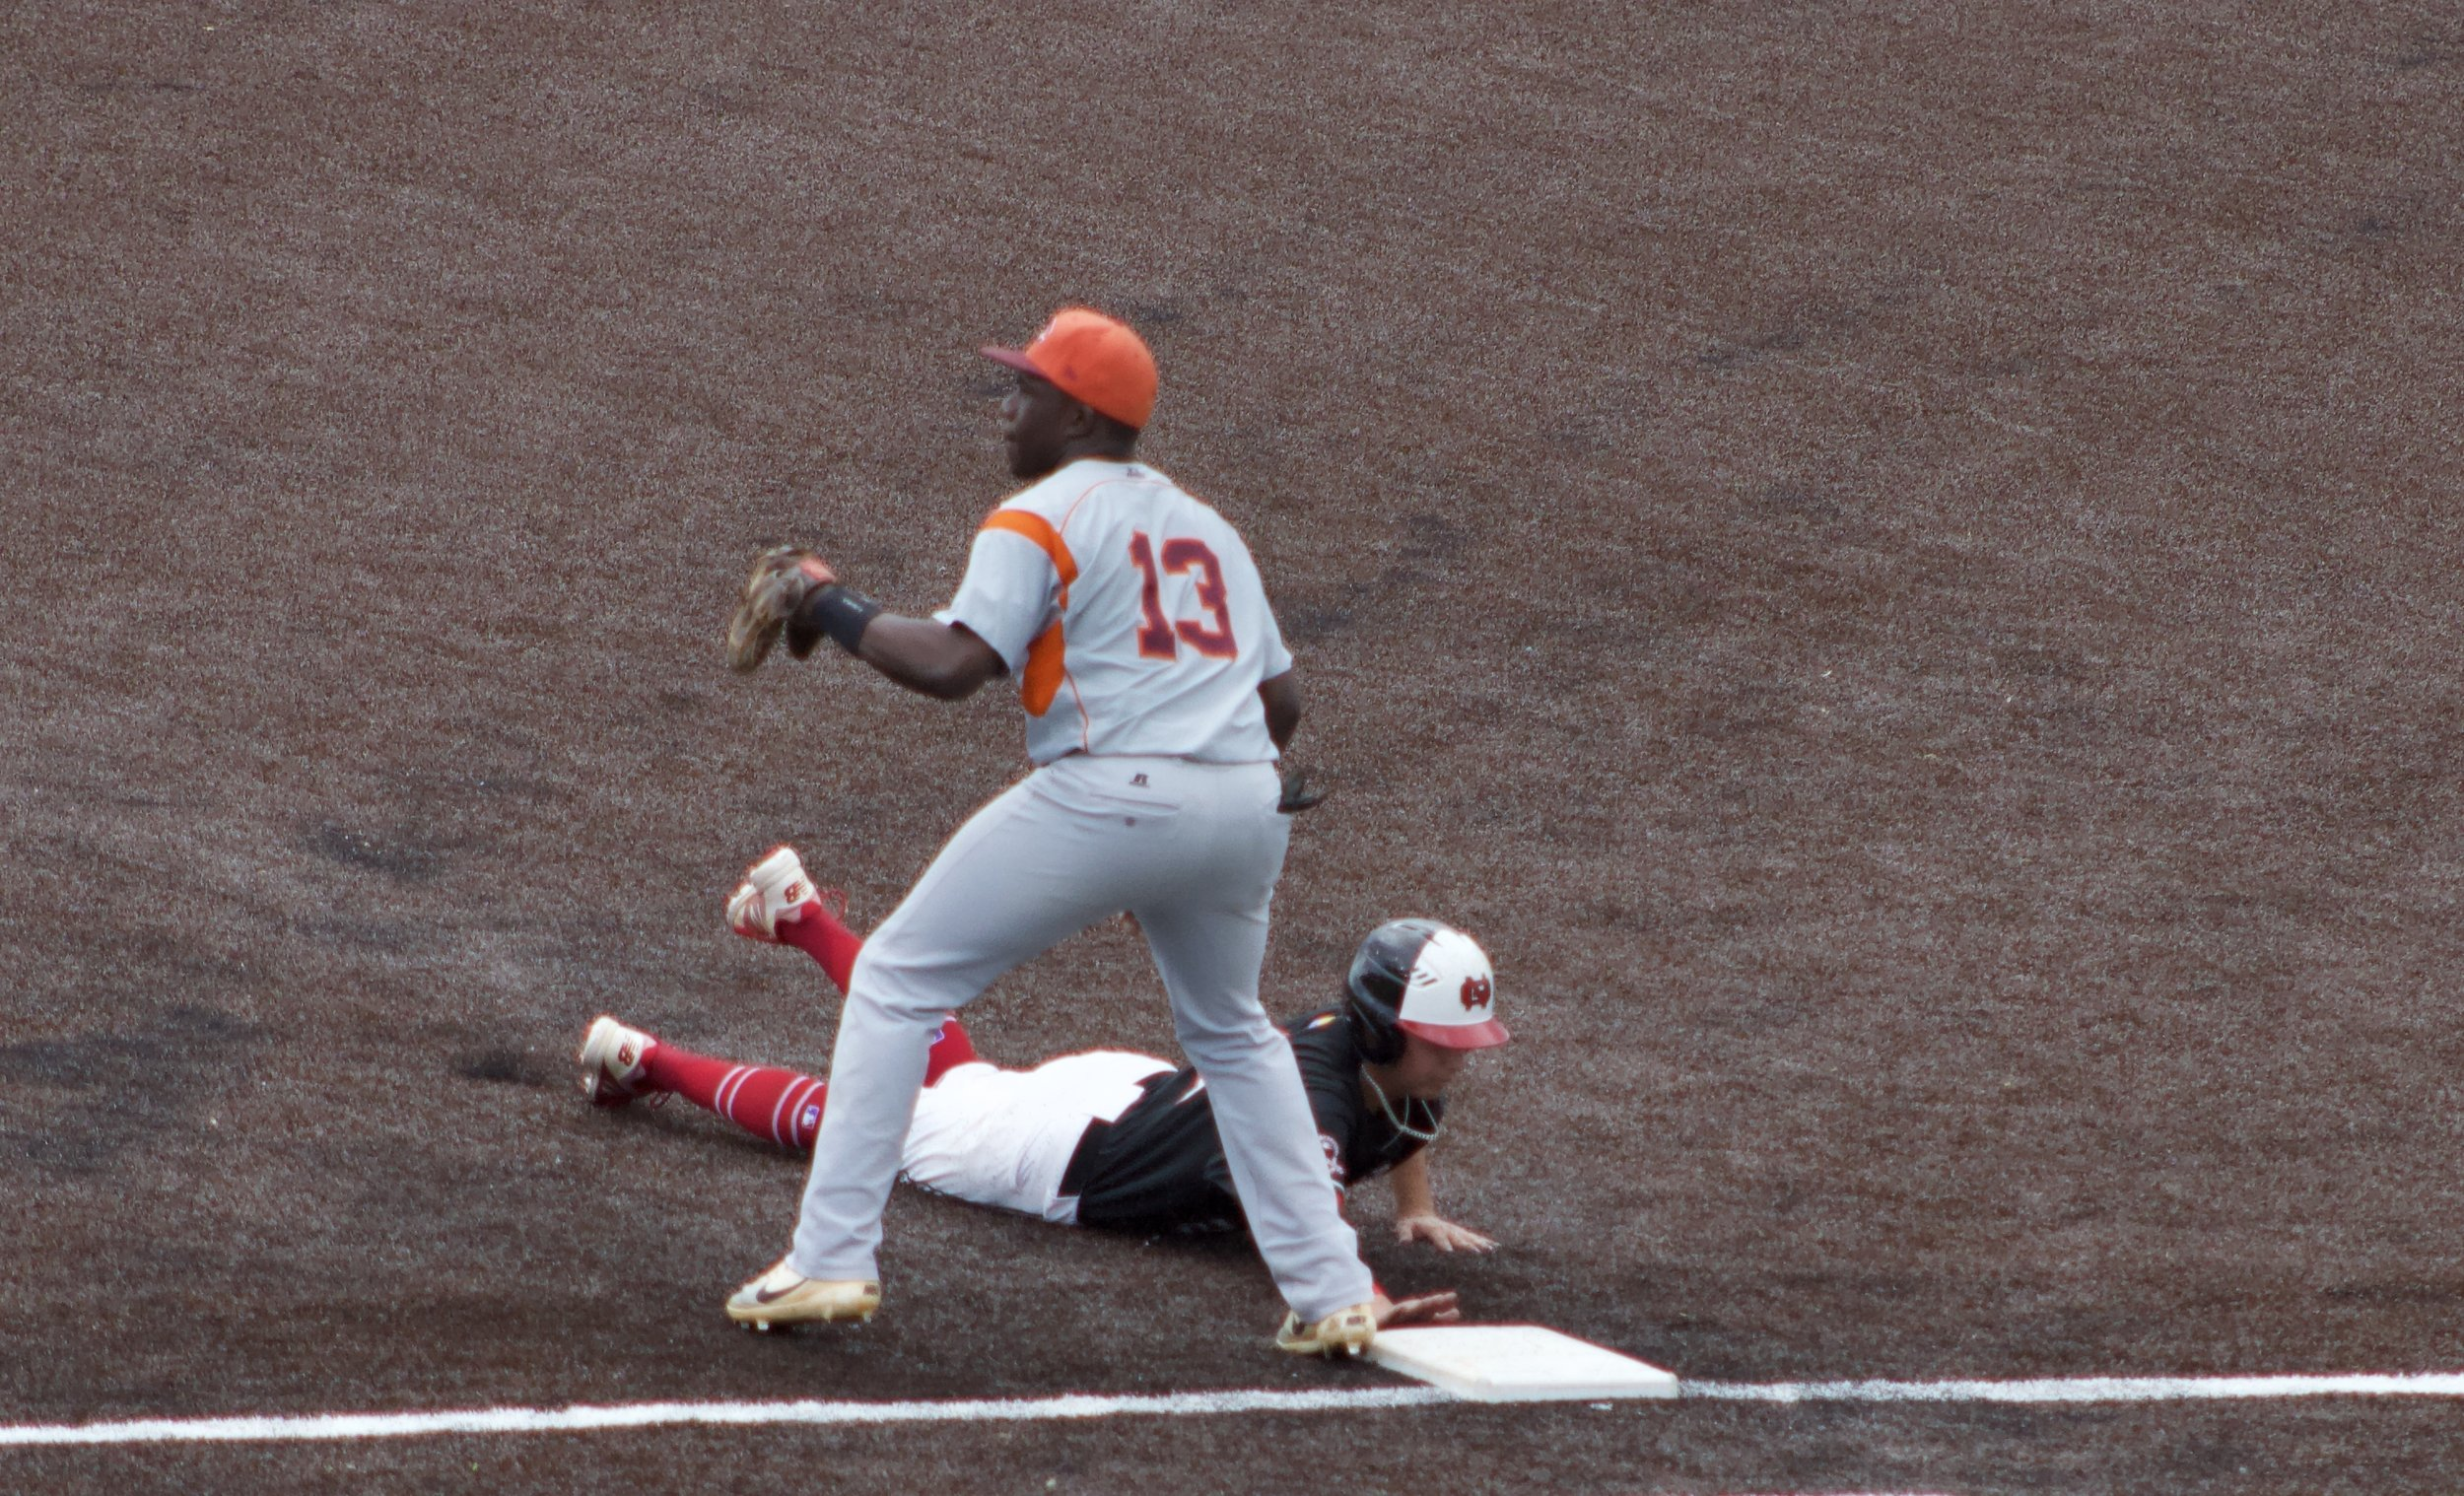 Utah Jones coming back safe after attempting to steal second base.